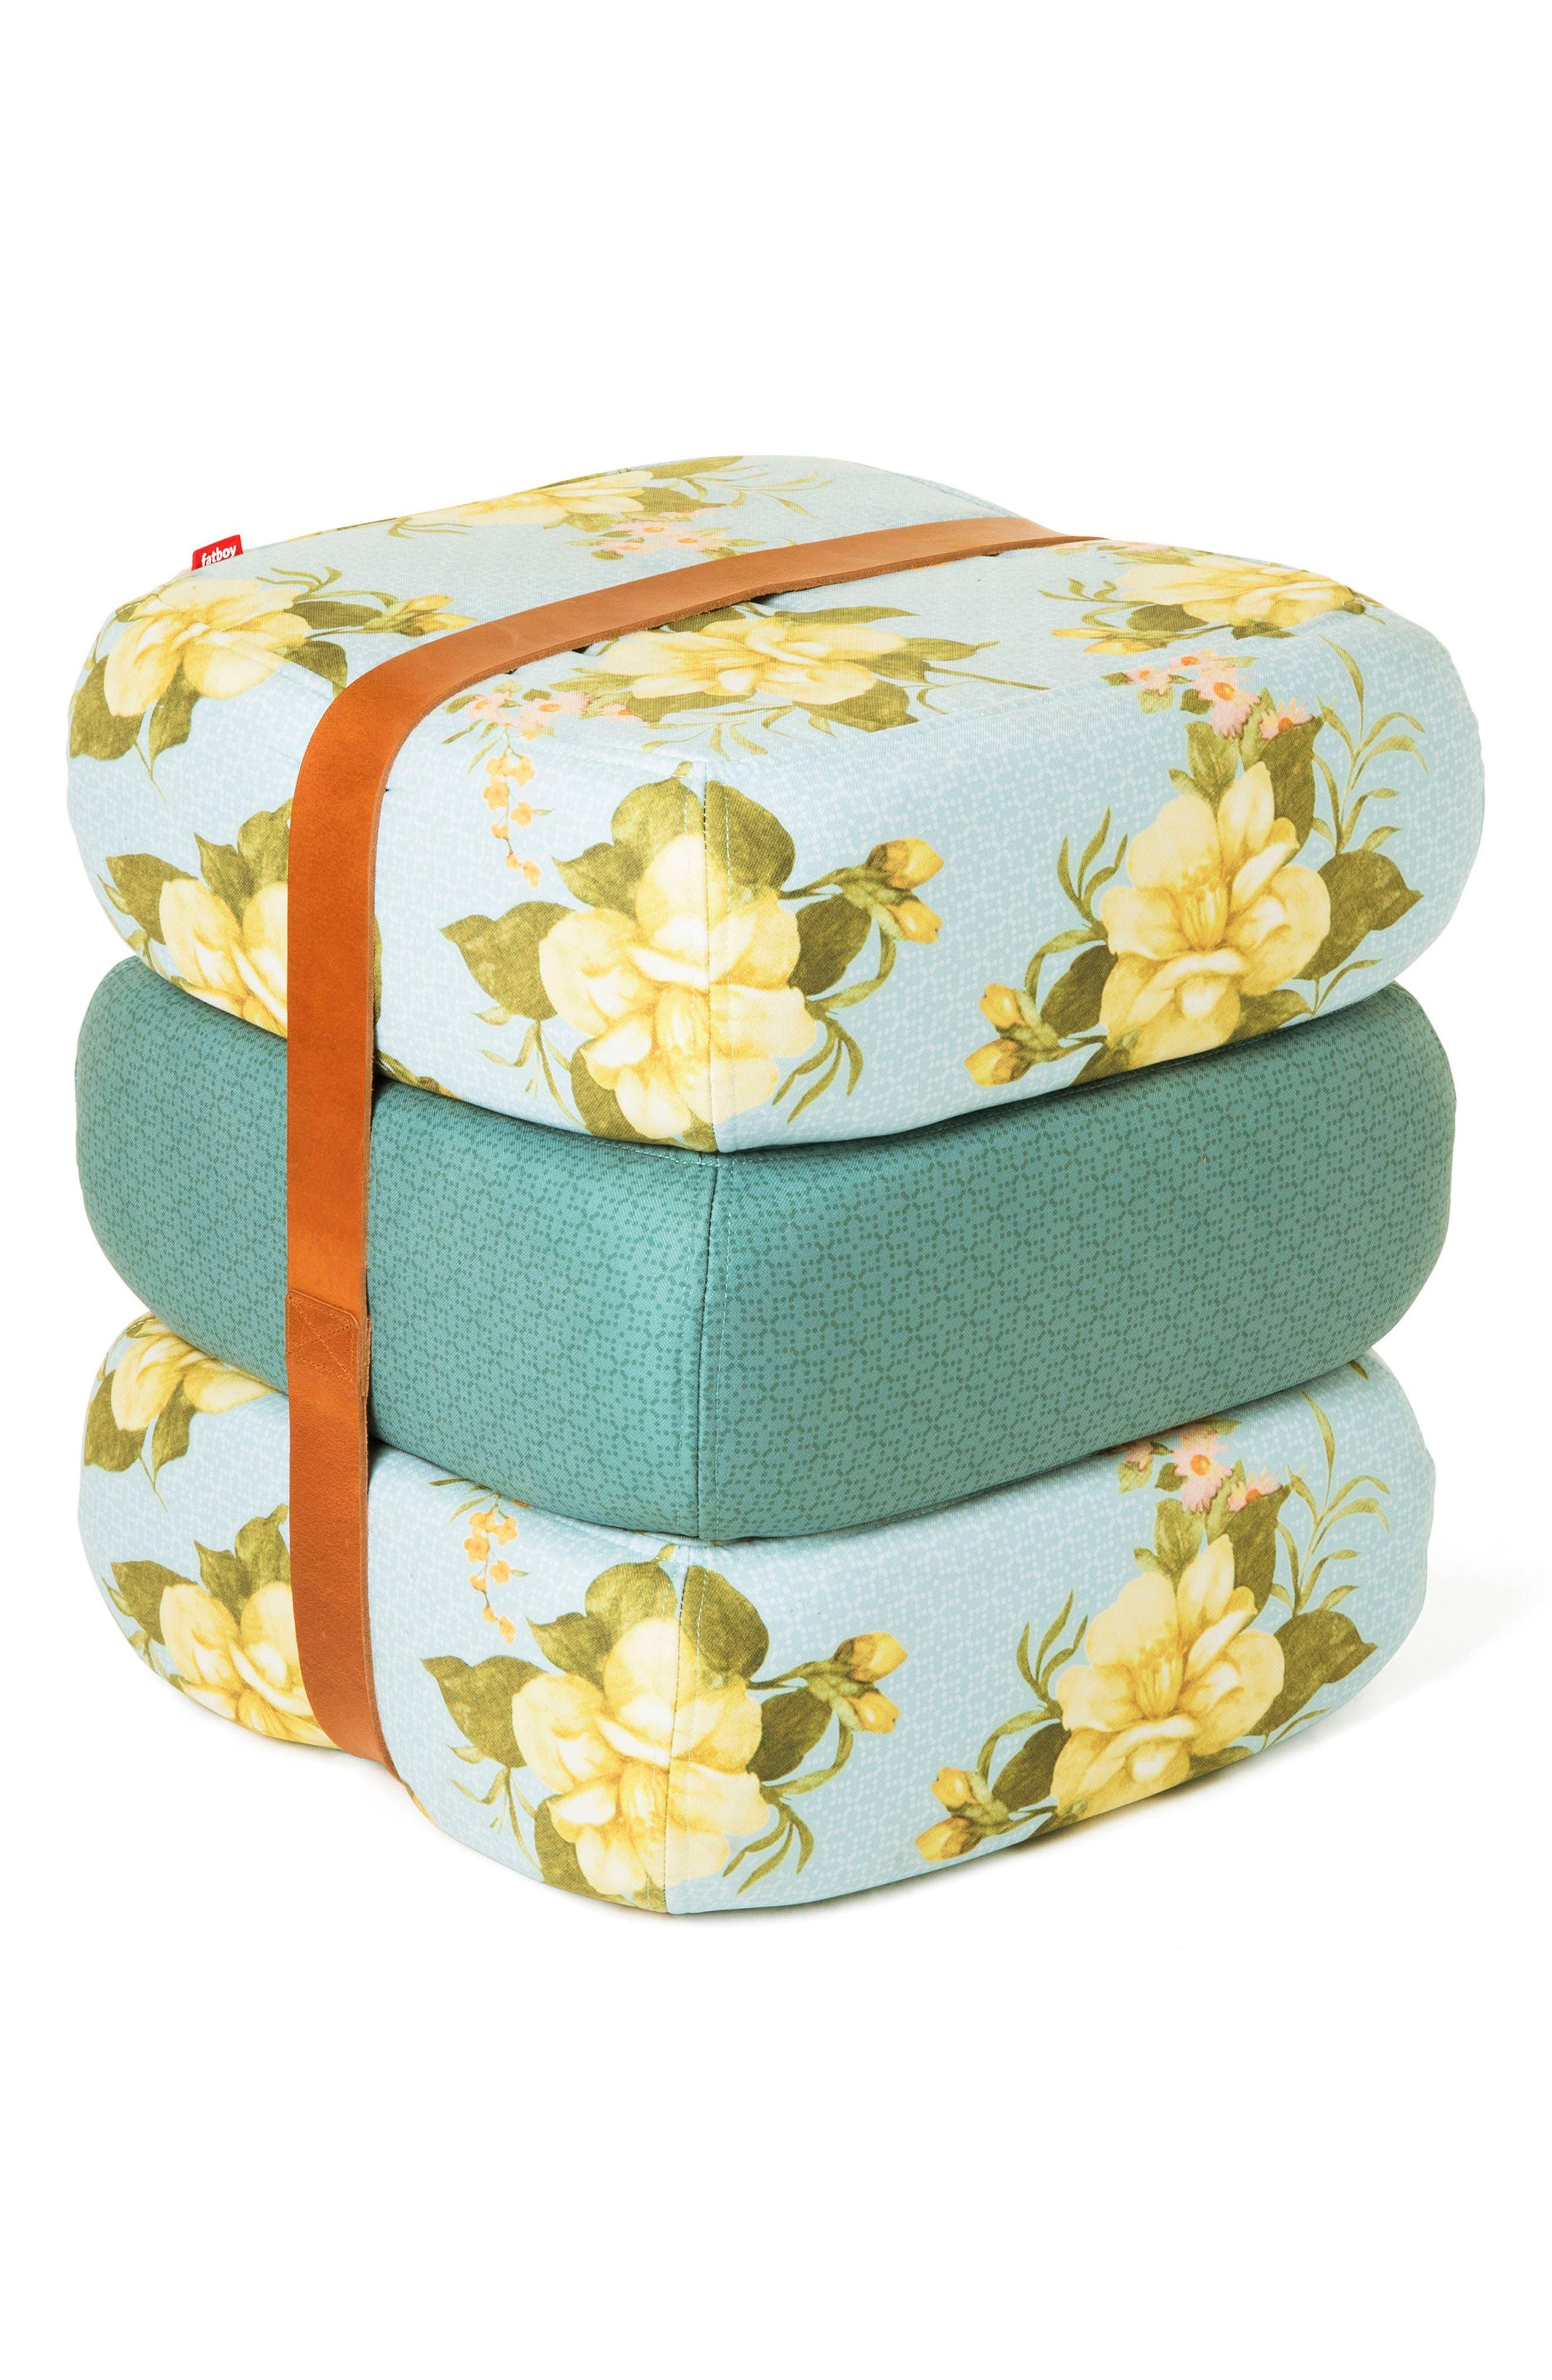 Alternate Image 1 Selected - Fatboy Baboesjka Set of 3 Pillows